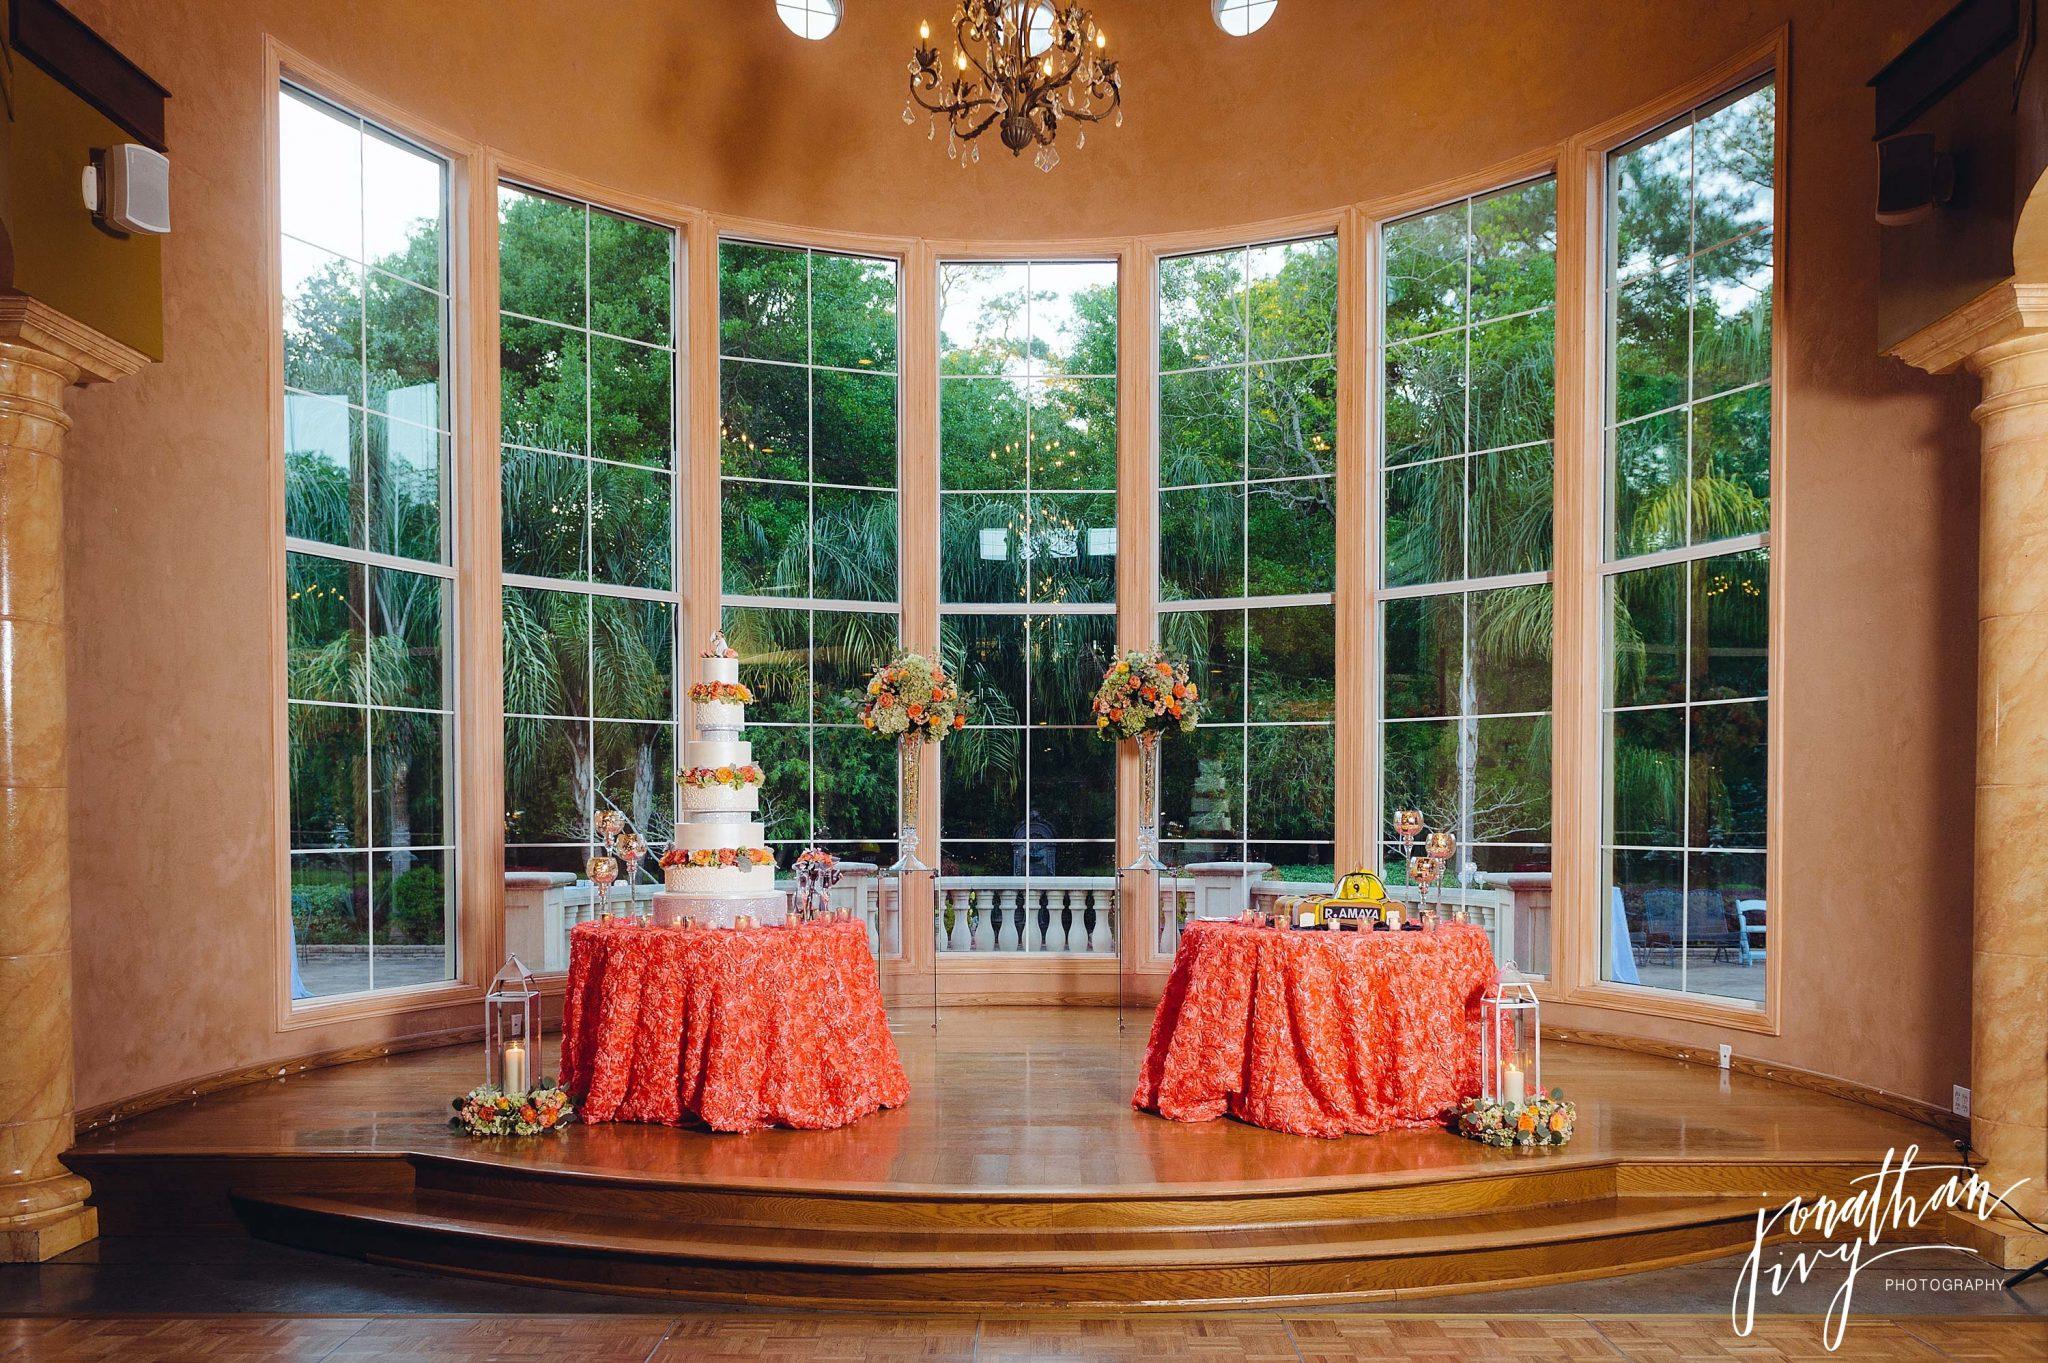 Chateau-polonez-wedding-houston_0035